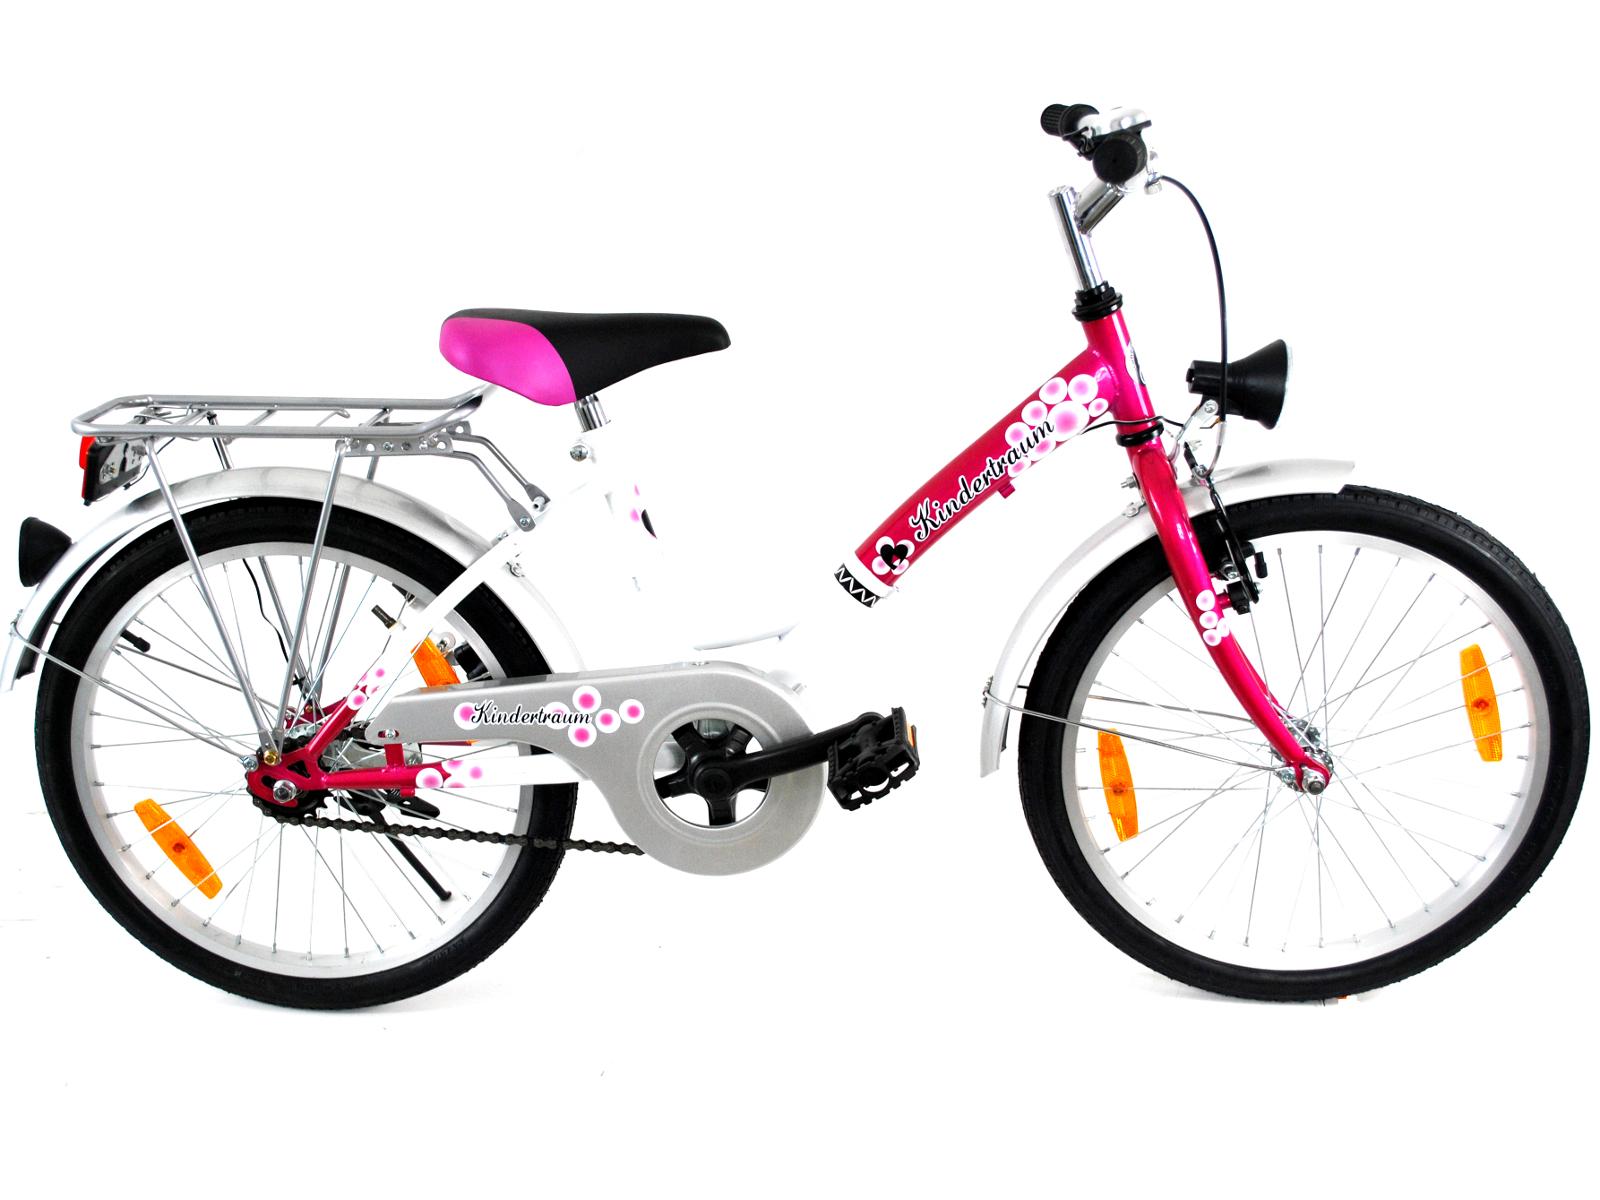 20 zoll kinder fahrrad m dchen jungen kinderrad fahrrad blau pink rot silber neu ebay. Black Bedroom Furniture Sets. Home Design Ideas